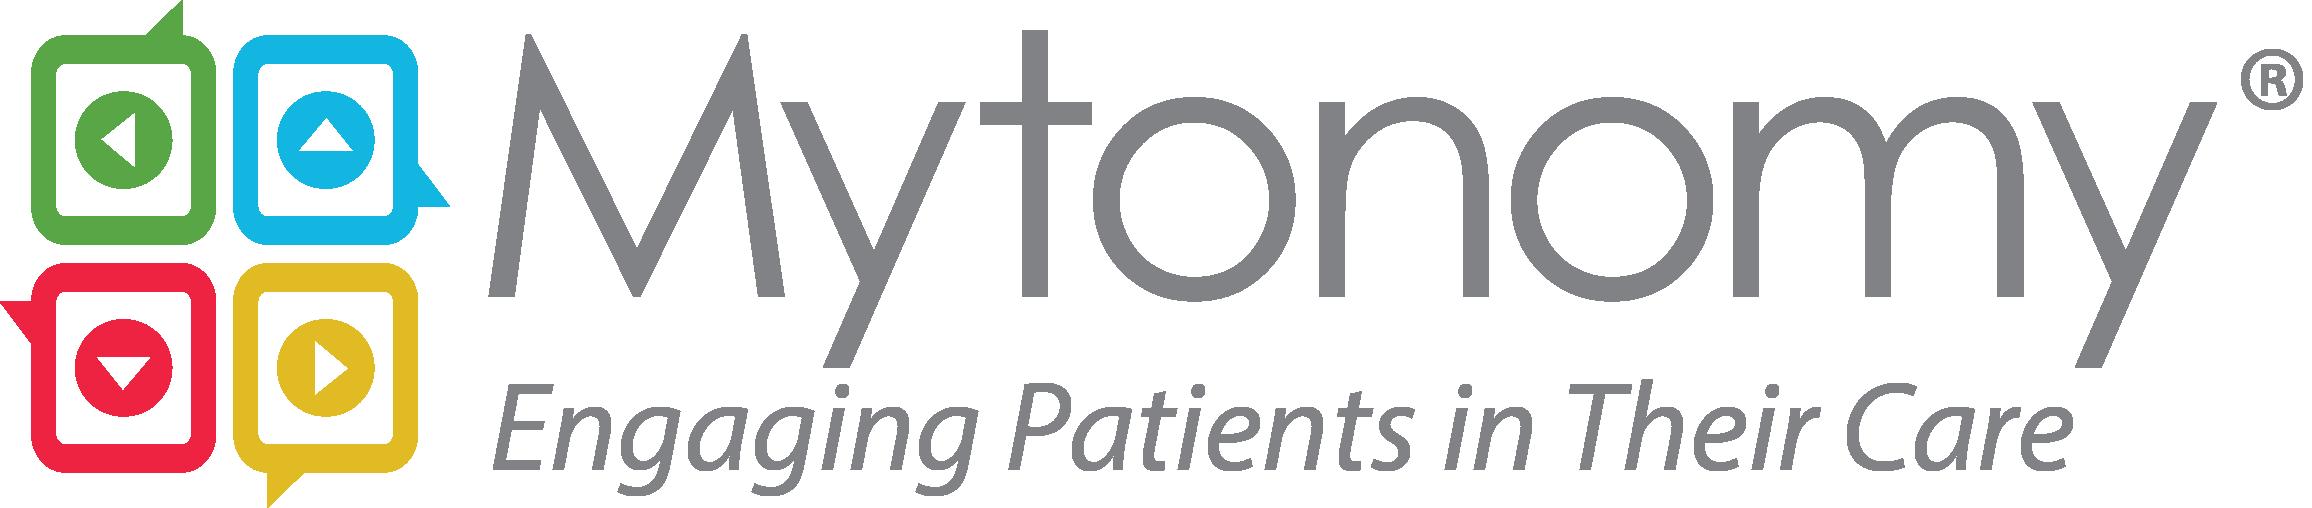 Mytonomy(R) logo+tagline grey FINAL-01